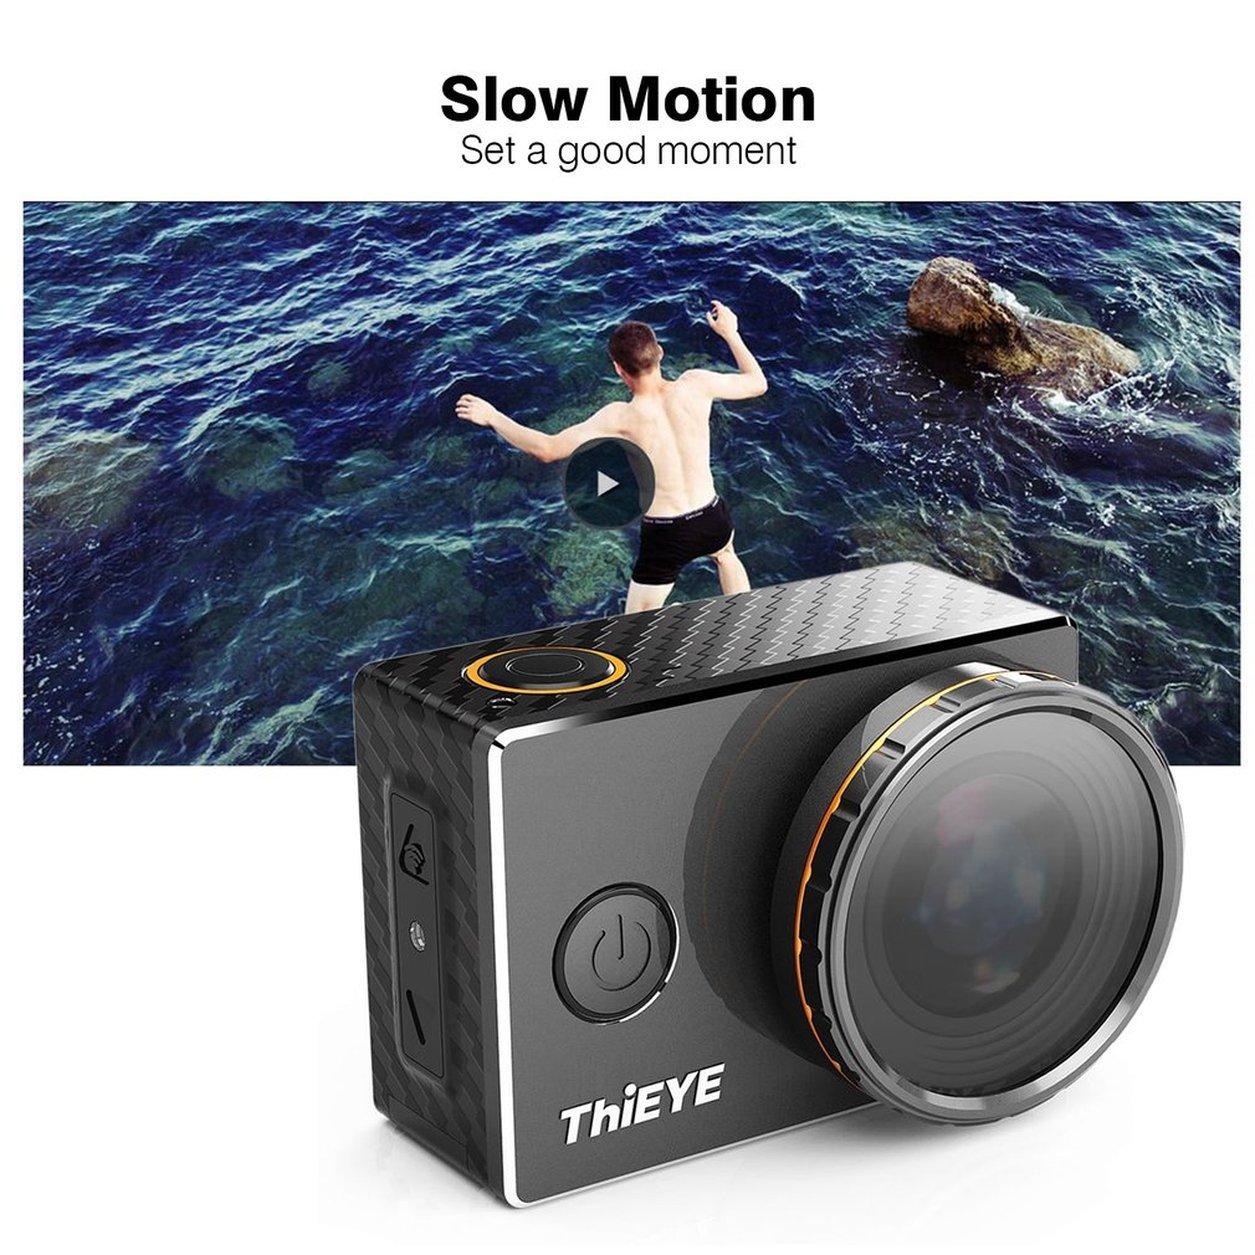 Dailyinshop ThiEYE V5s HD 4 Karat 2,0 Zoll Display Wasserdichte Action Kamera 1080 P Sport Kamera (Farbe  Schwarz)